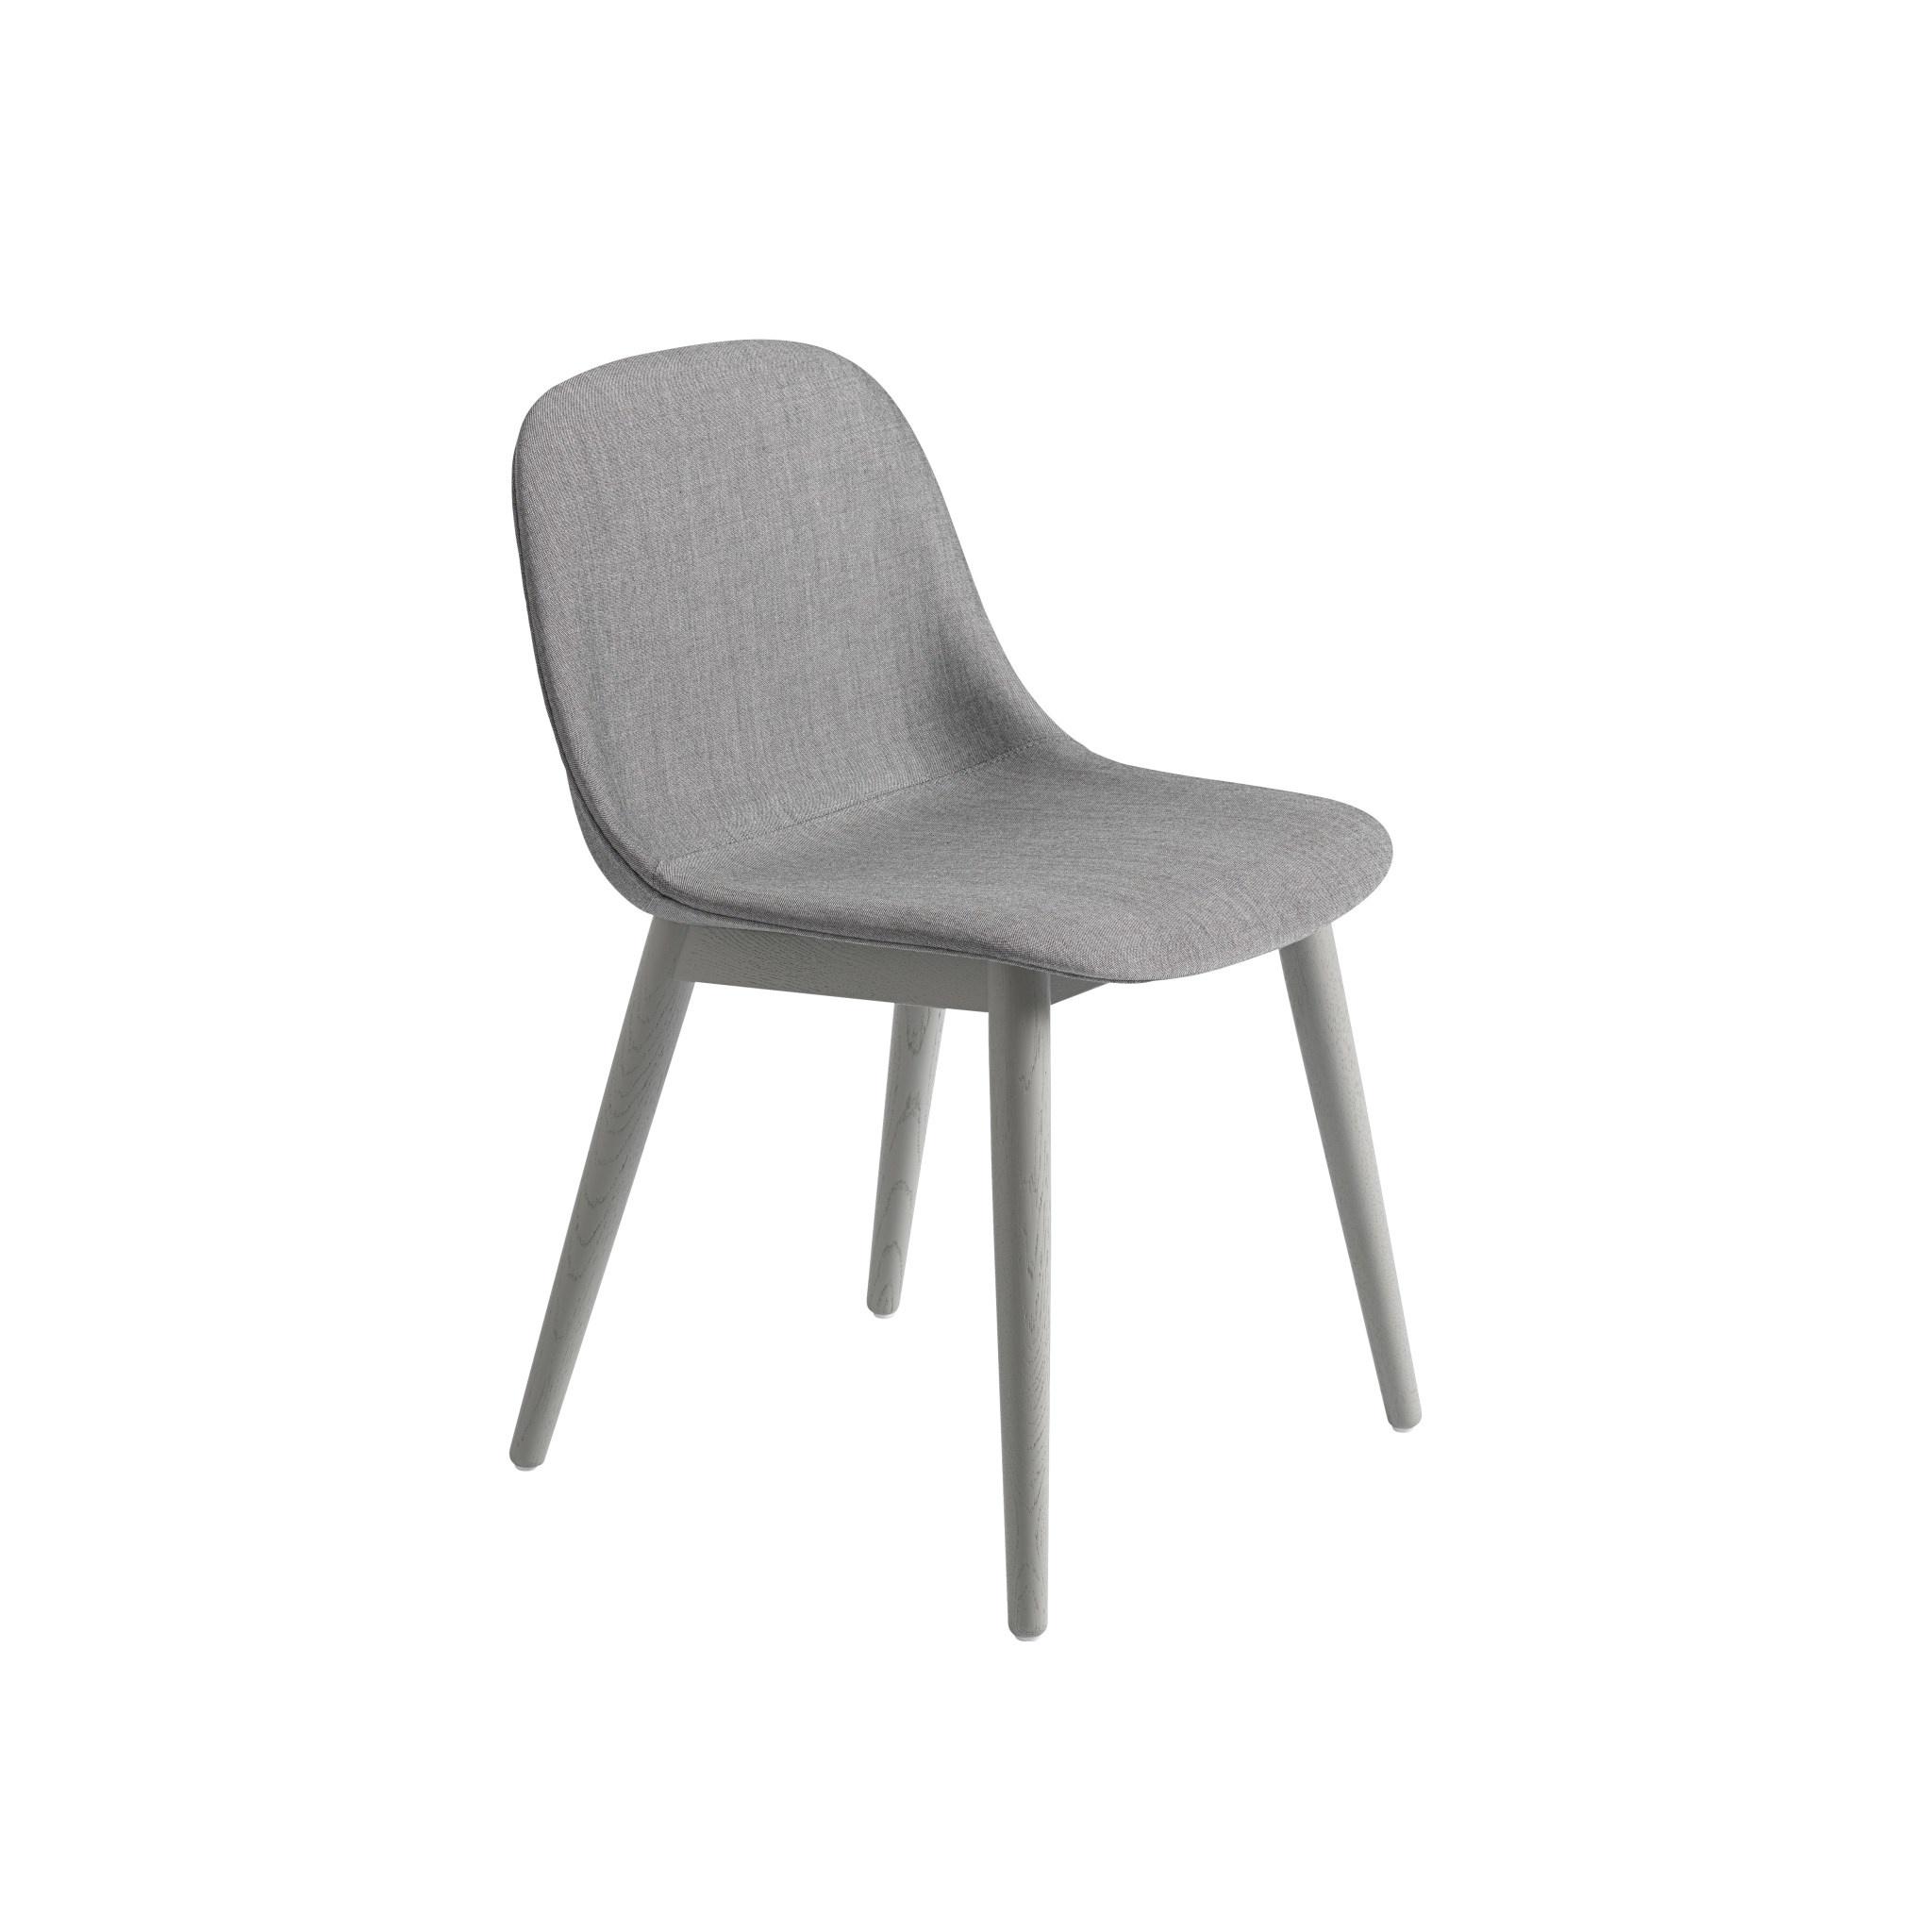 Fiber side chair wood base-7